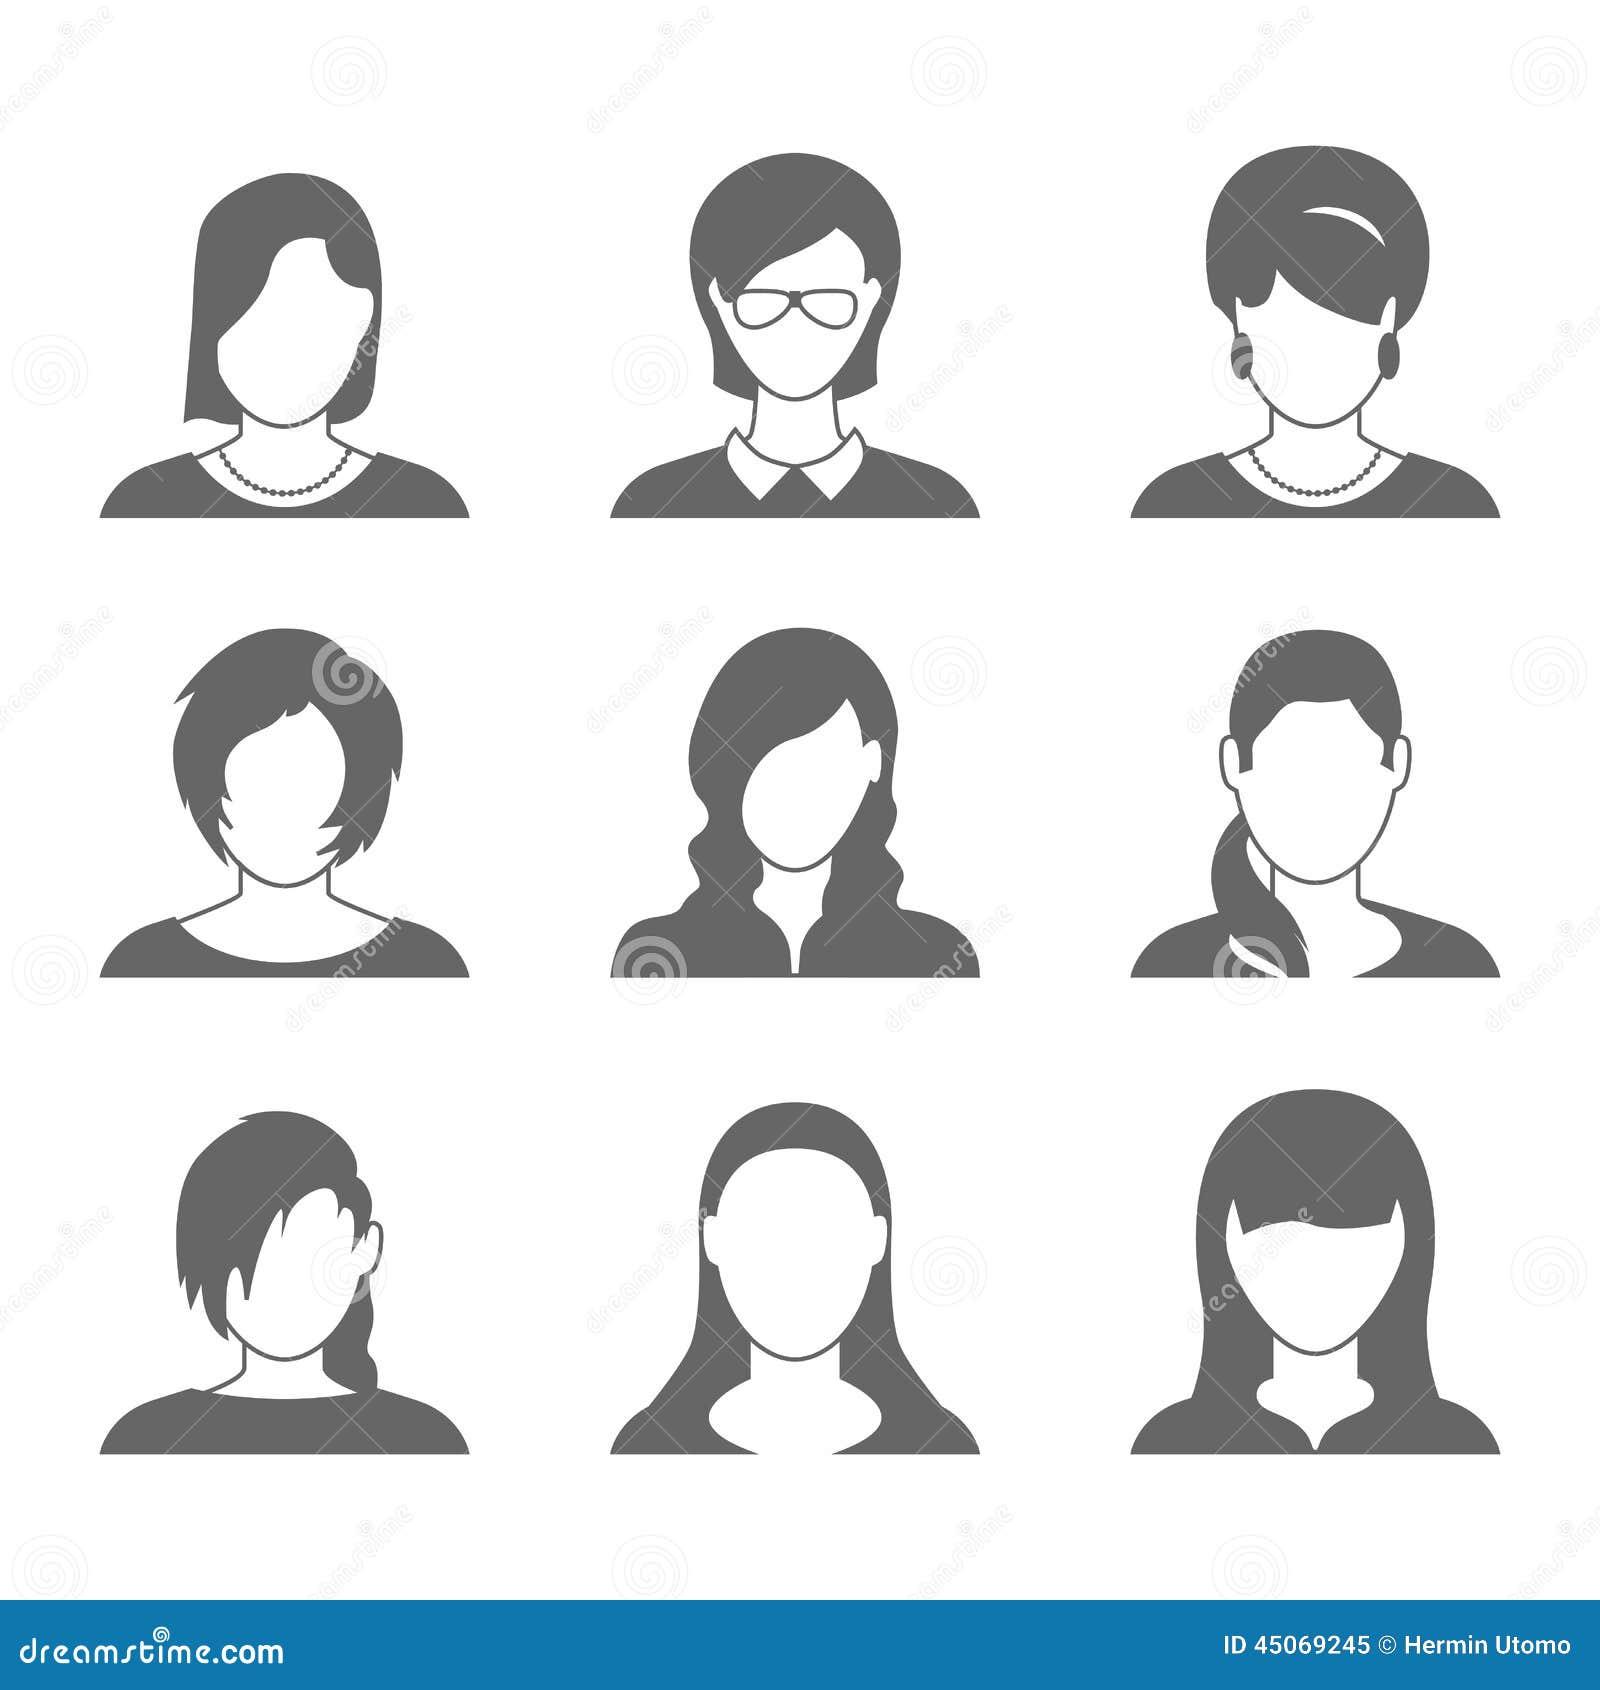 Female Profile Icons Stock Vector - Image: 45069245